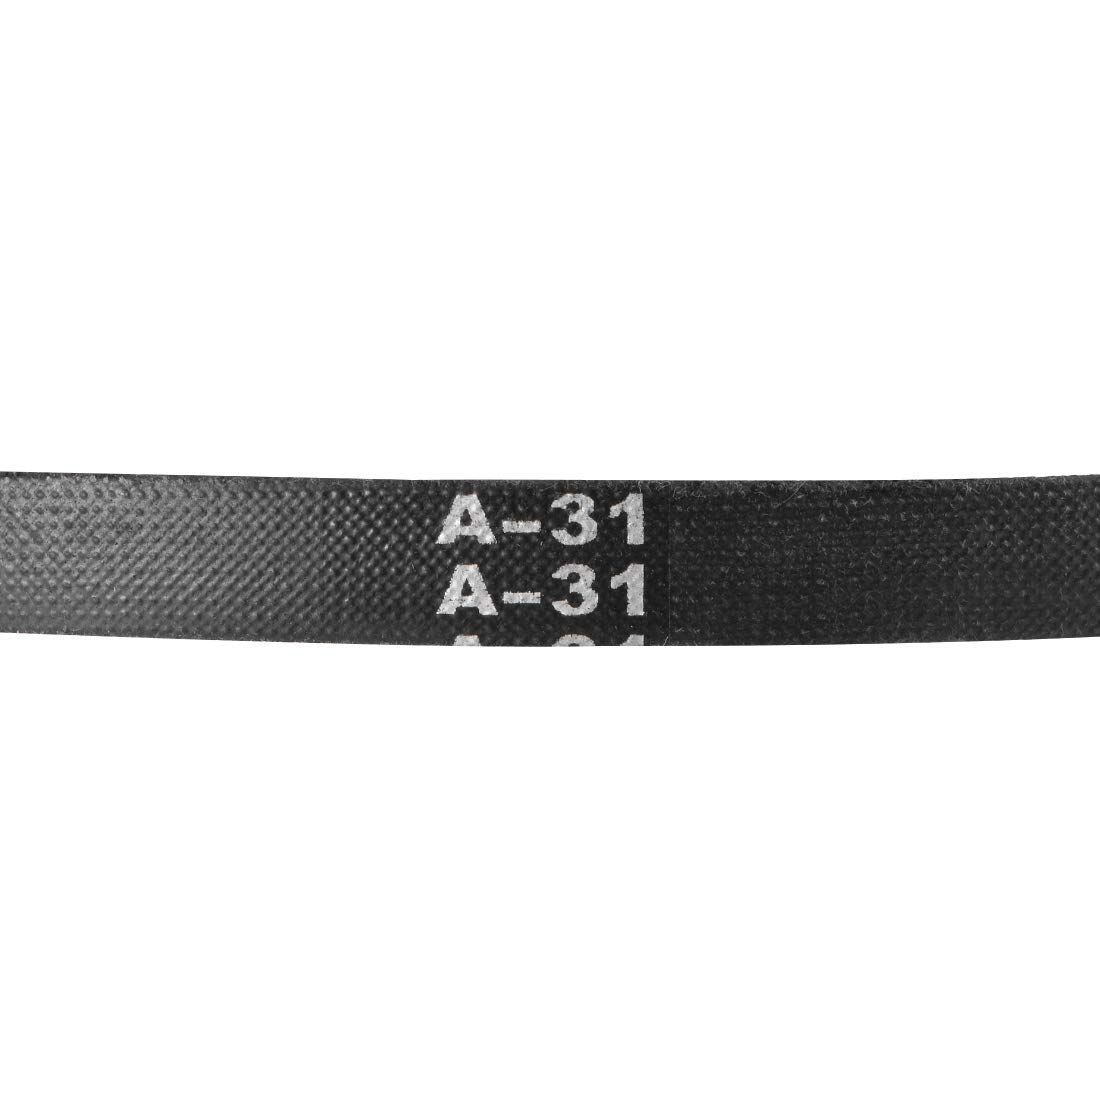 A-Section Rubber Drive Belt 2pcs uxcell A31 V-Belts 31 Pitch Length